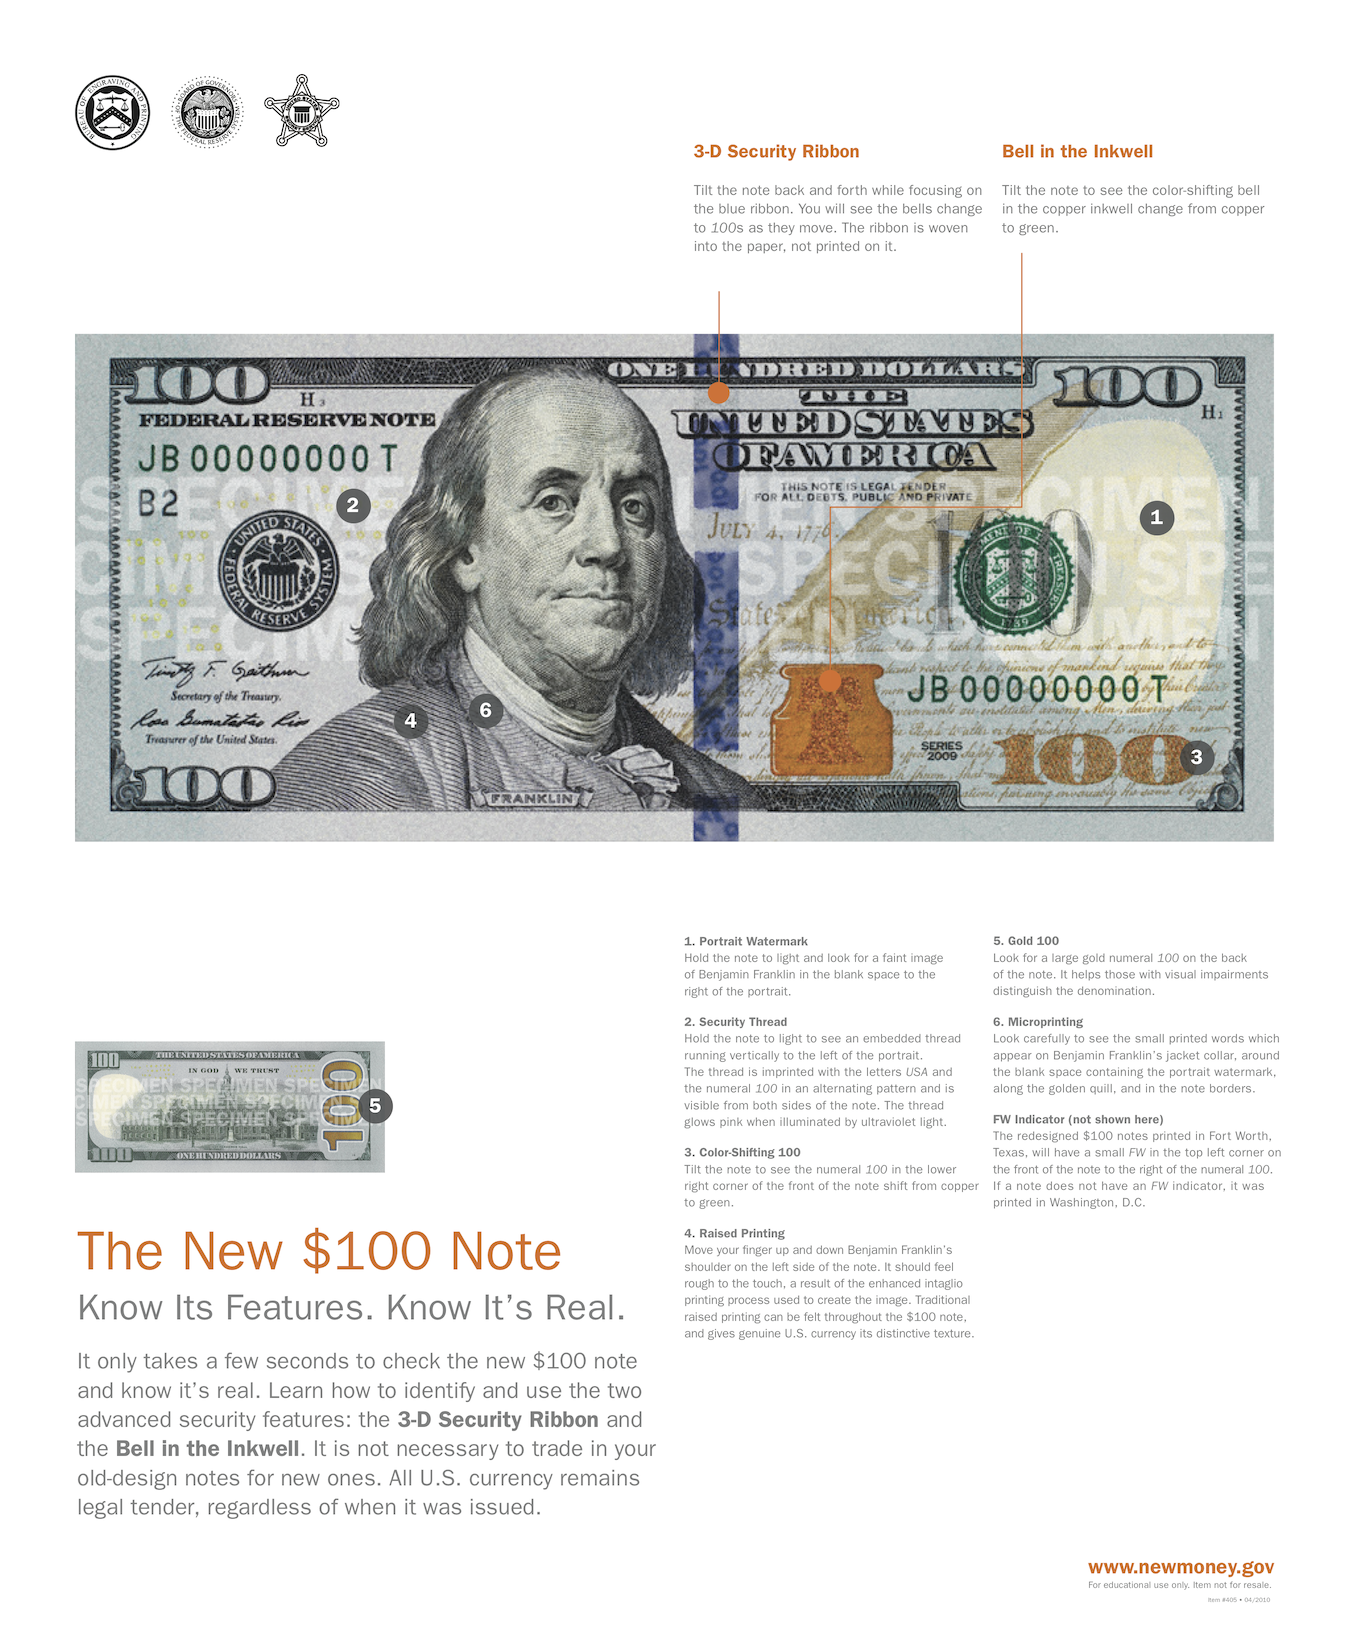 http://coinsblog.ws/wp-content/uploads/2013/12/100FRNinfo.png